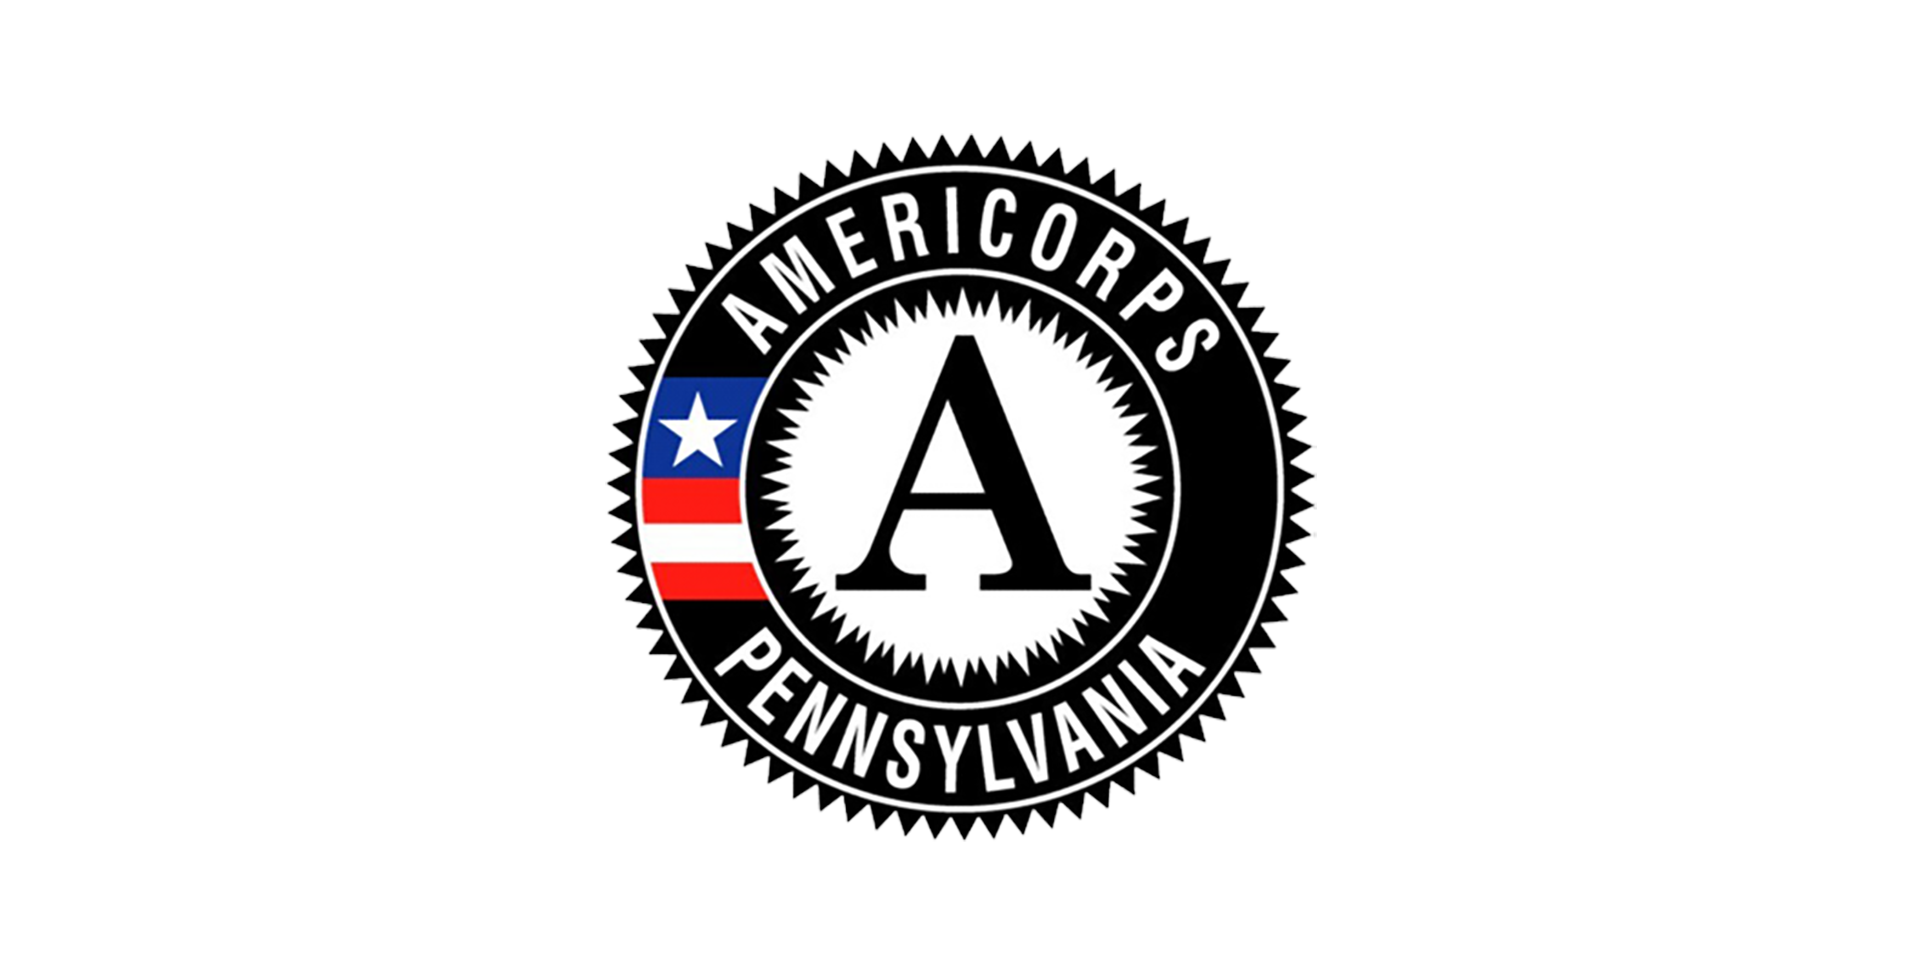 Americorps Pennsylvania